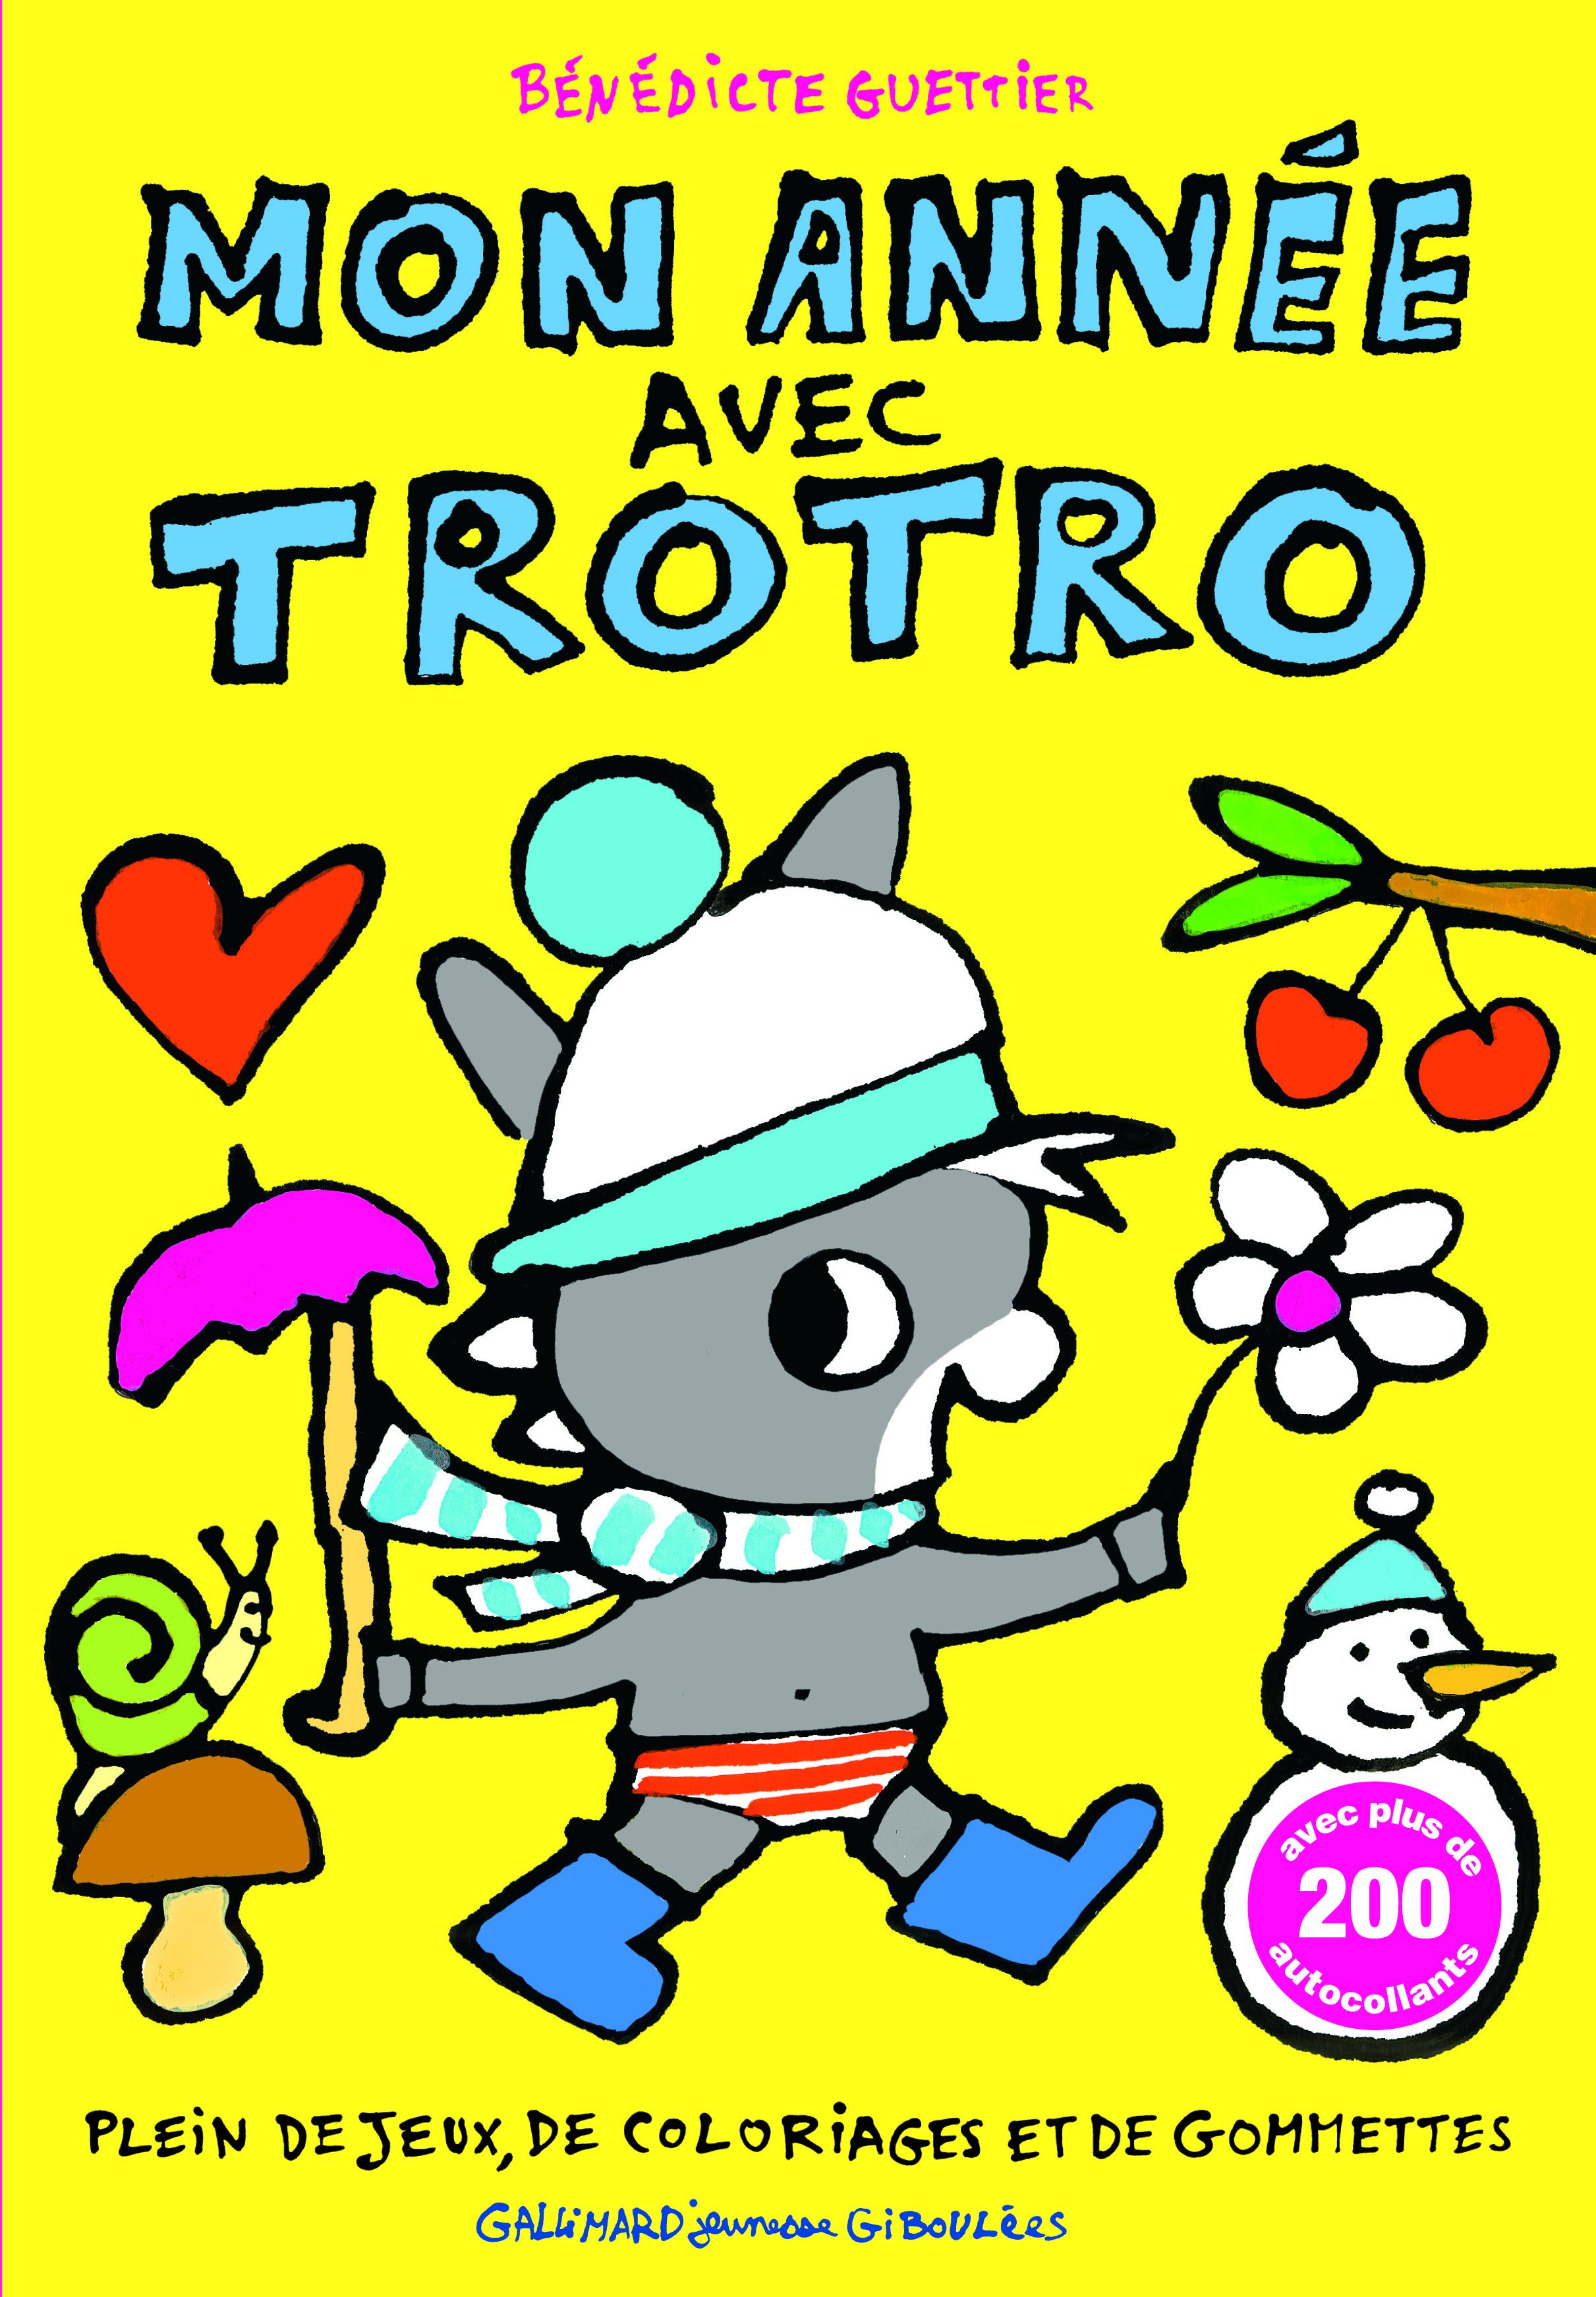 MON ANNEE AVEC TROTRO